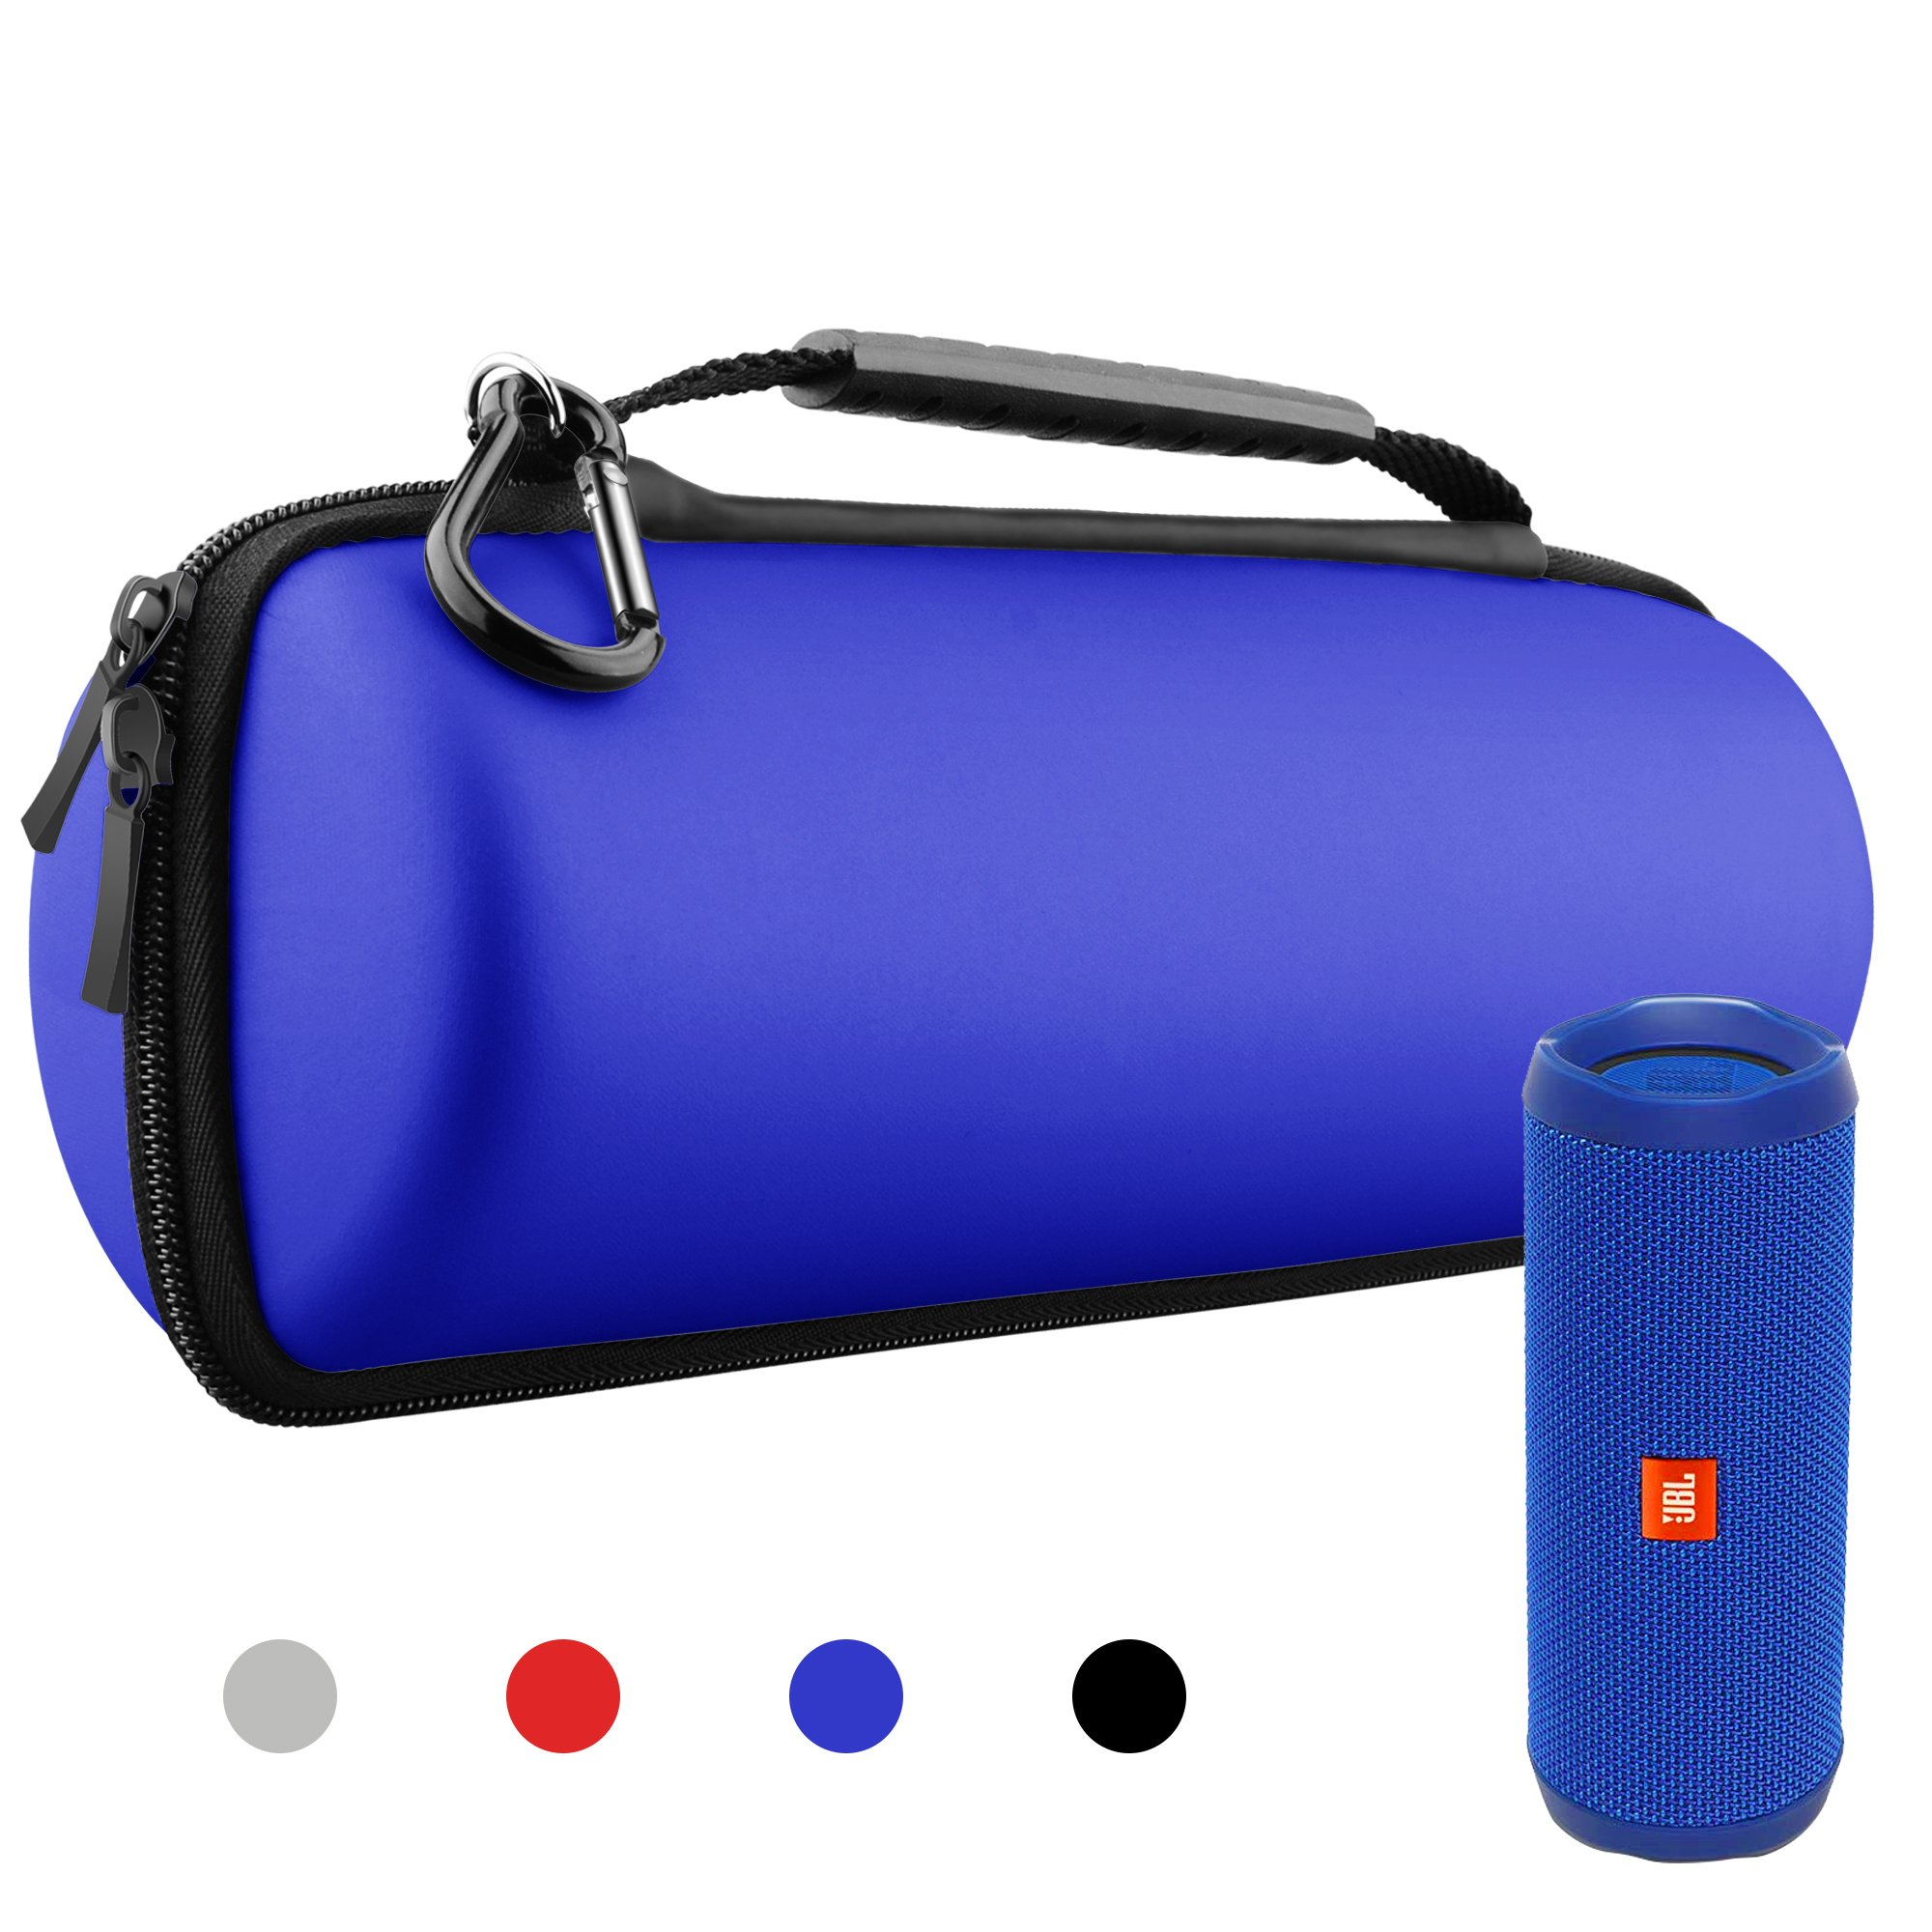 Hanlesi Case for JBL Flip 4 and Flip 3, Waterproof Carrying Accessories Case Wireless Bluetooth Speaker Travel Bag for Flip4/Flip3 Case Royal Blue